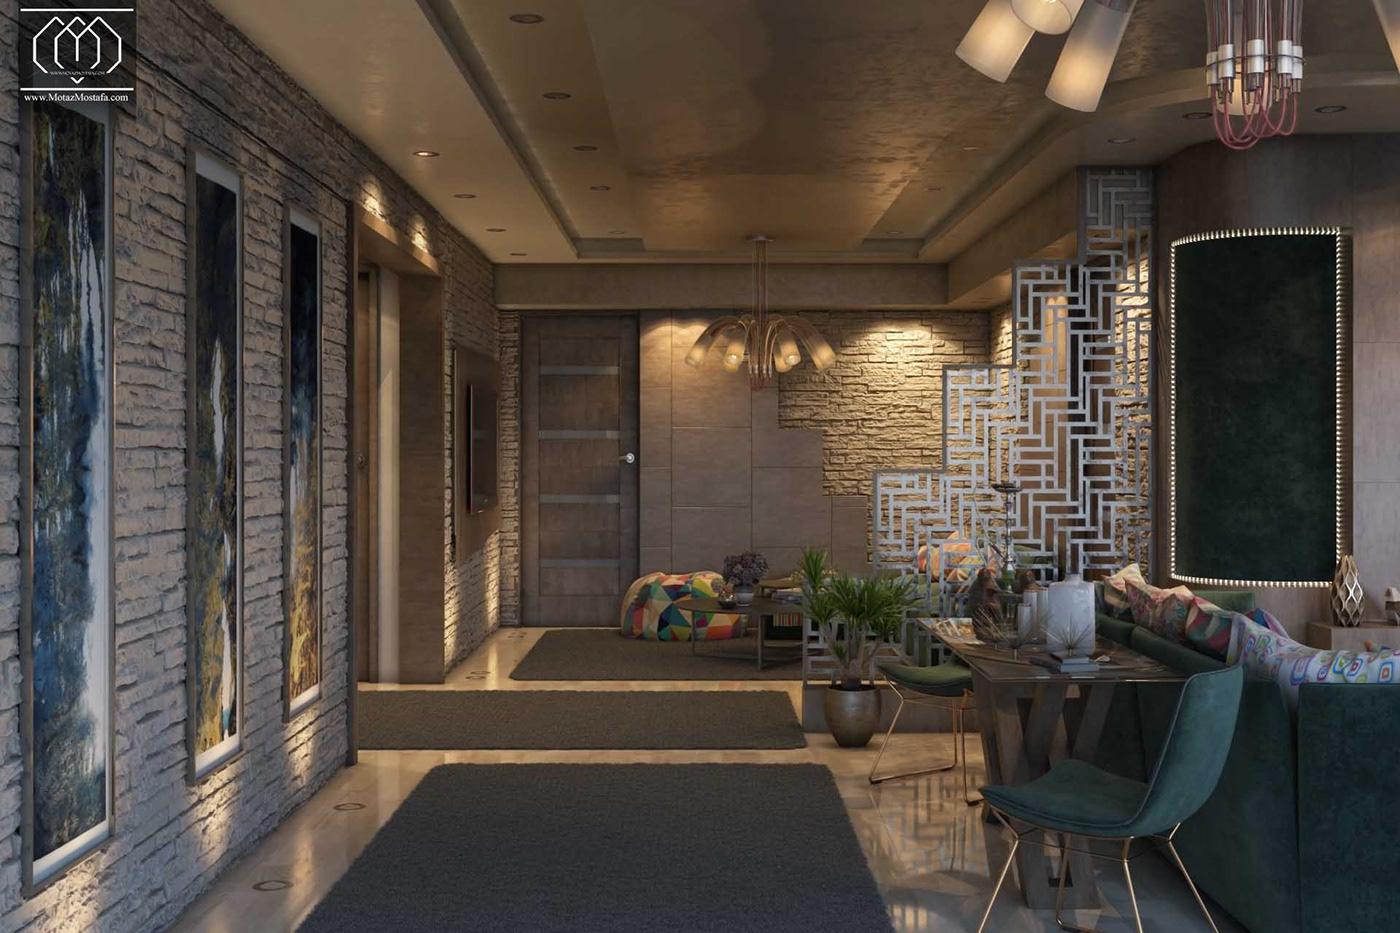 architecture Inteiror Design Interior design 3dsmax vray photoshop visualization graphics Motaz mostafa